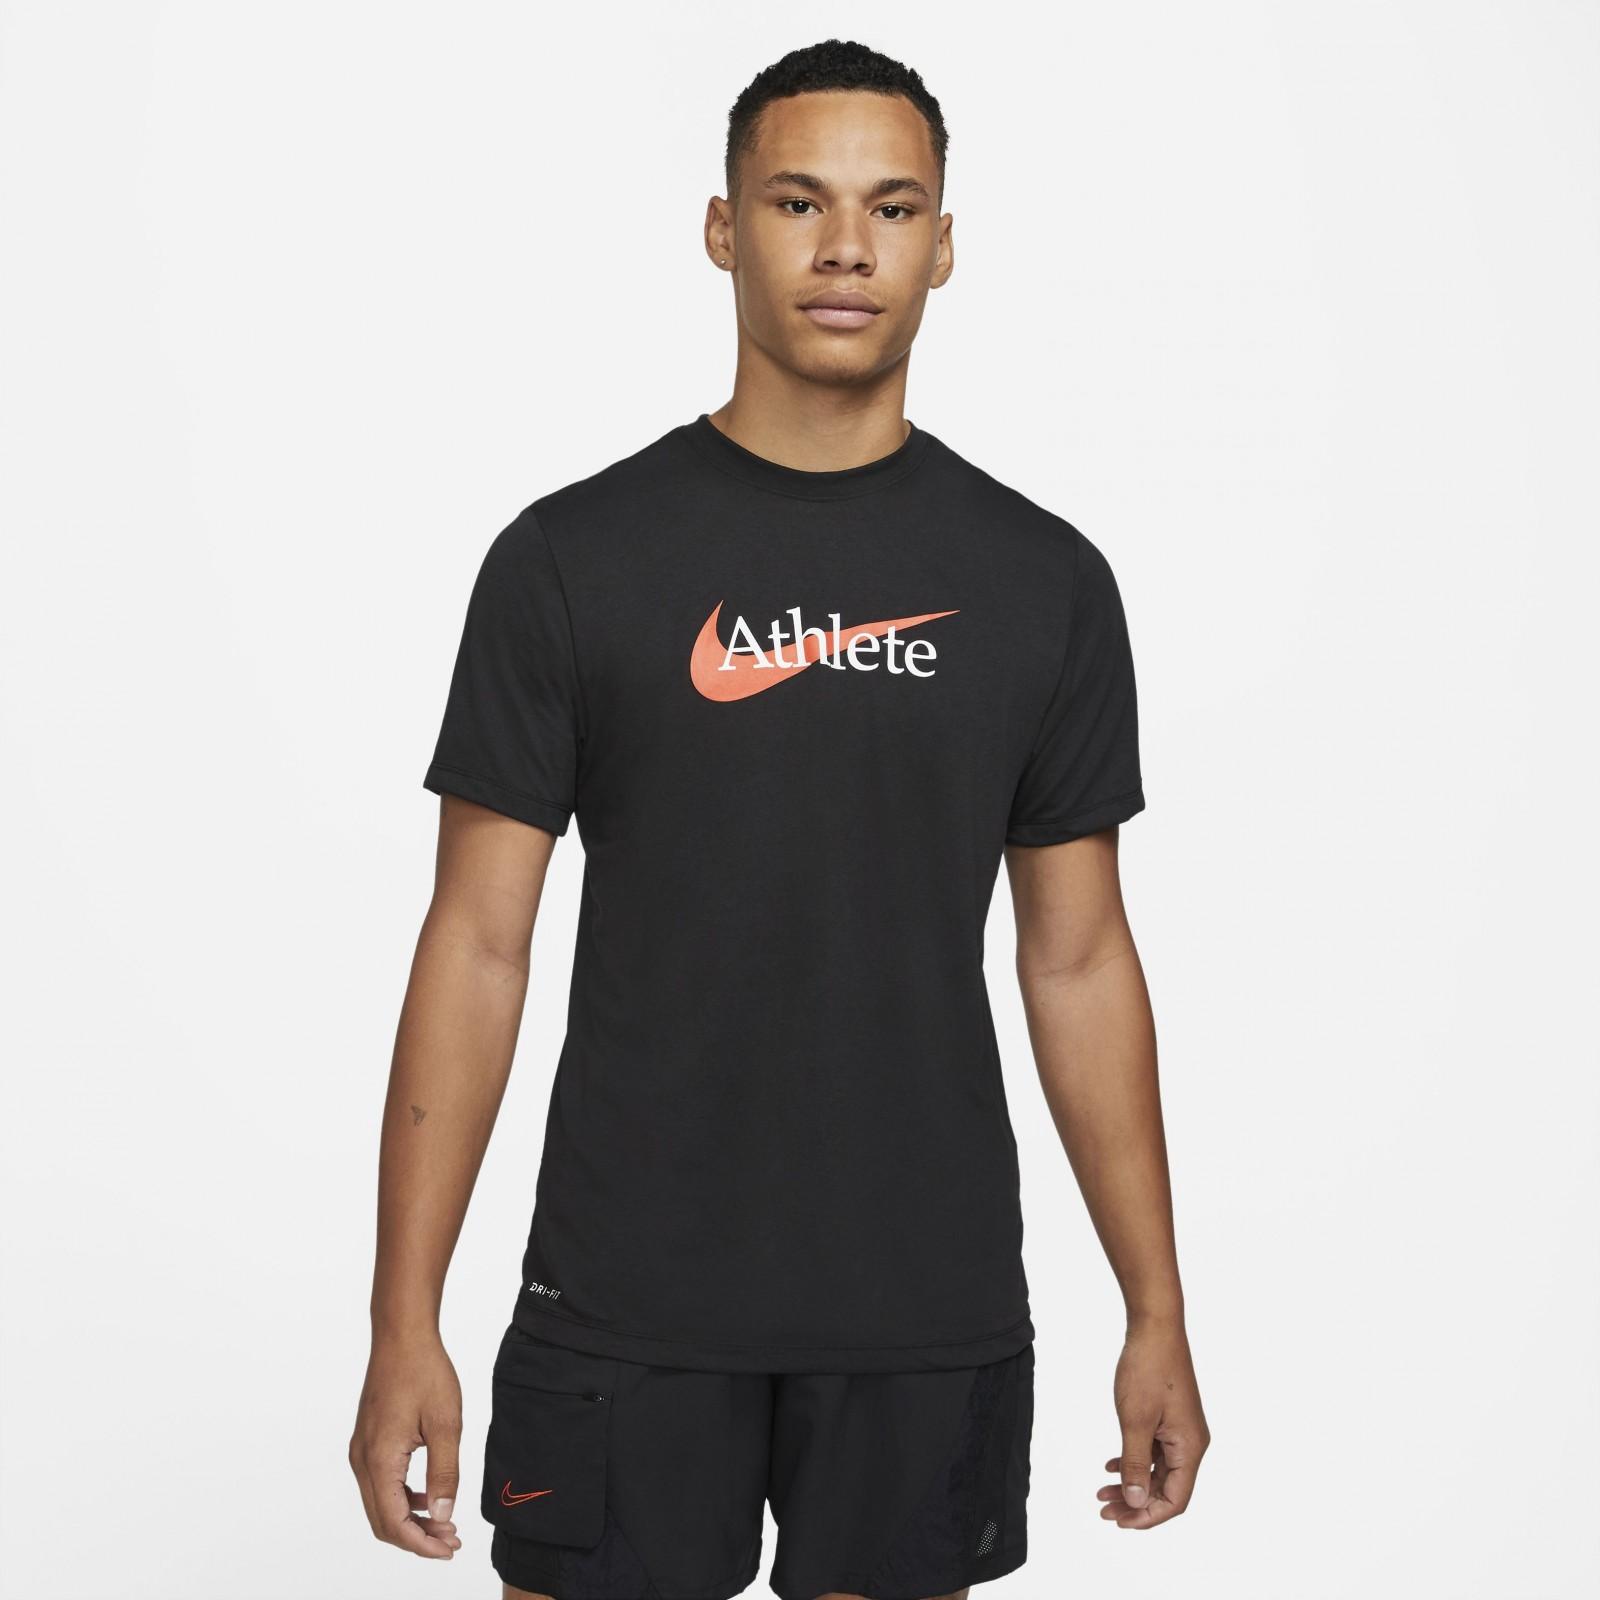 Nike Dri-FIT BLACK/TEAM ORANGE